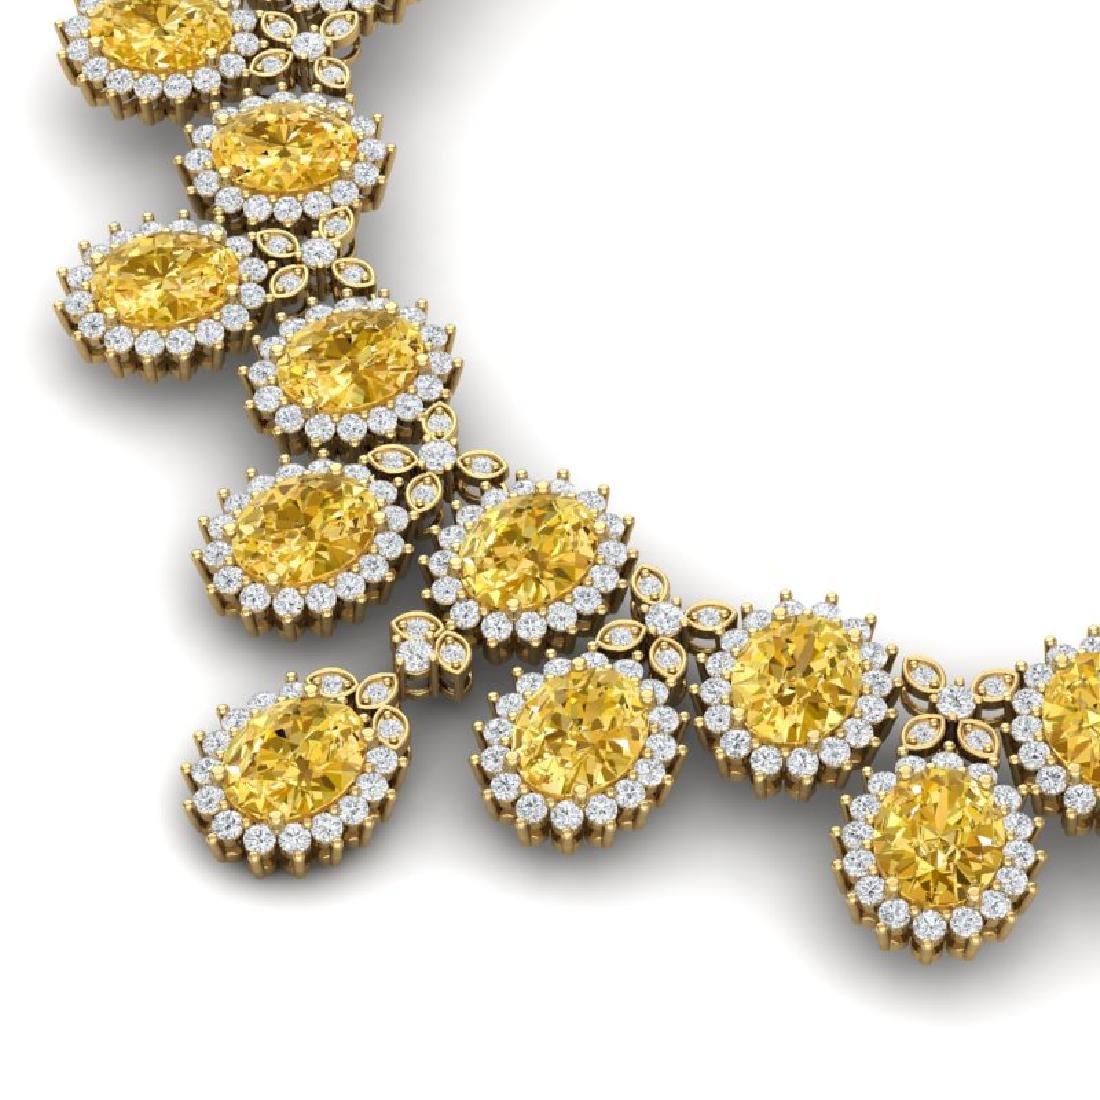 76 CTW Royalty Canary Citrine & VS Diamond Necklace 18K - 2